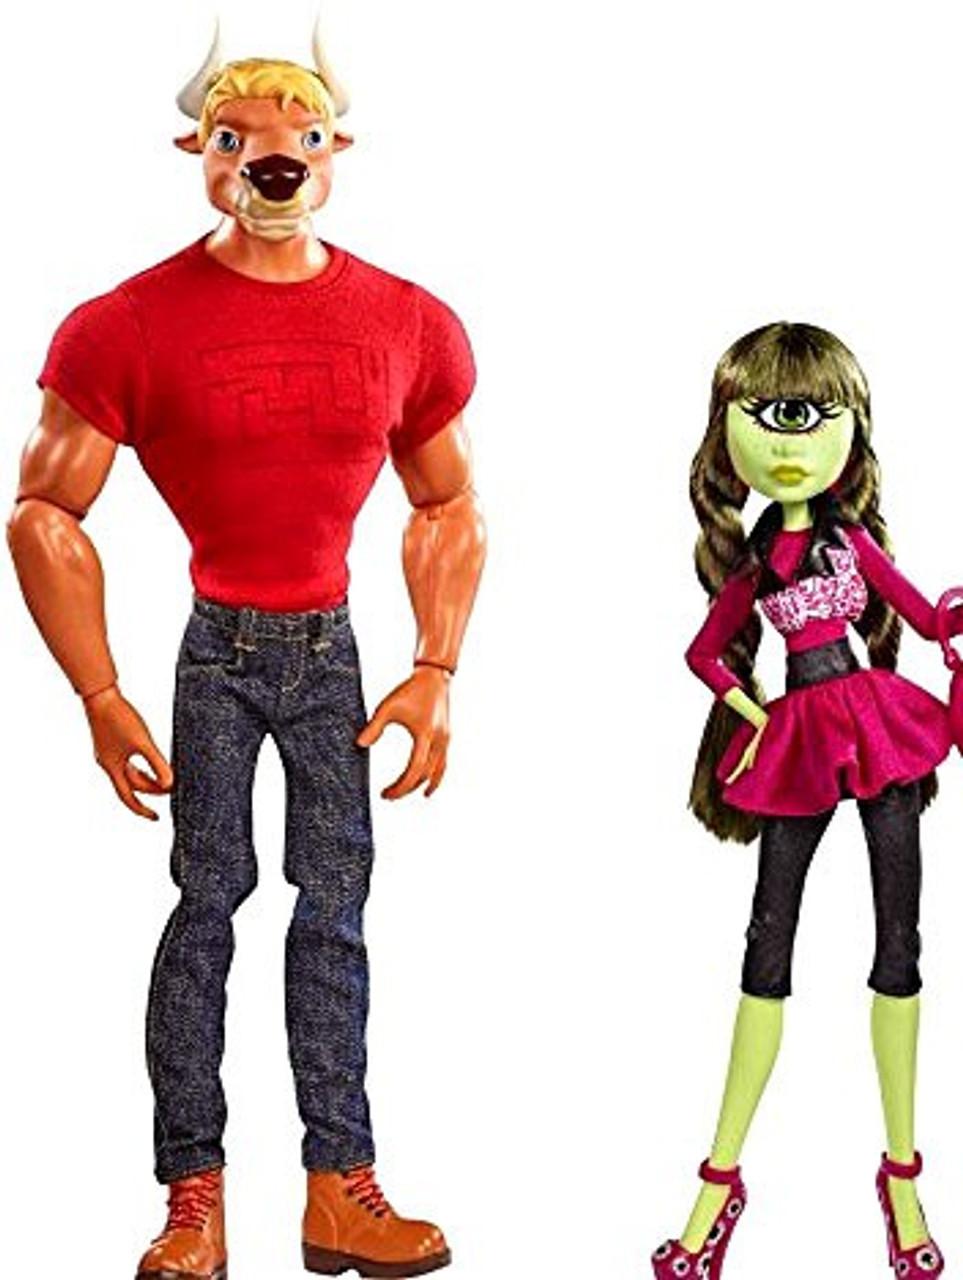 Monster High Manny Taur & Iris Clops Exclusive 10.5-Inch Doll Set